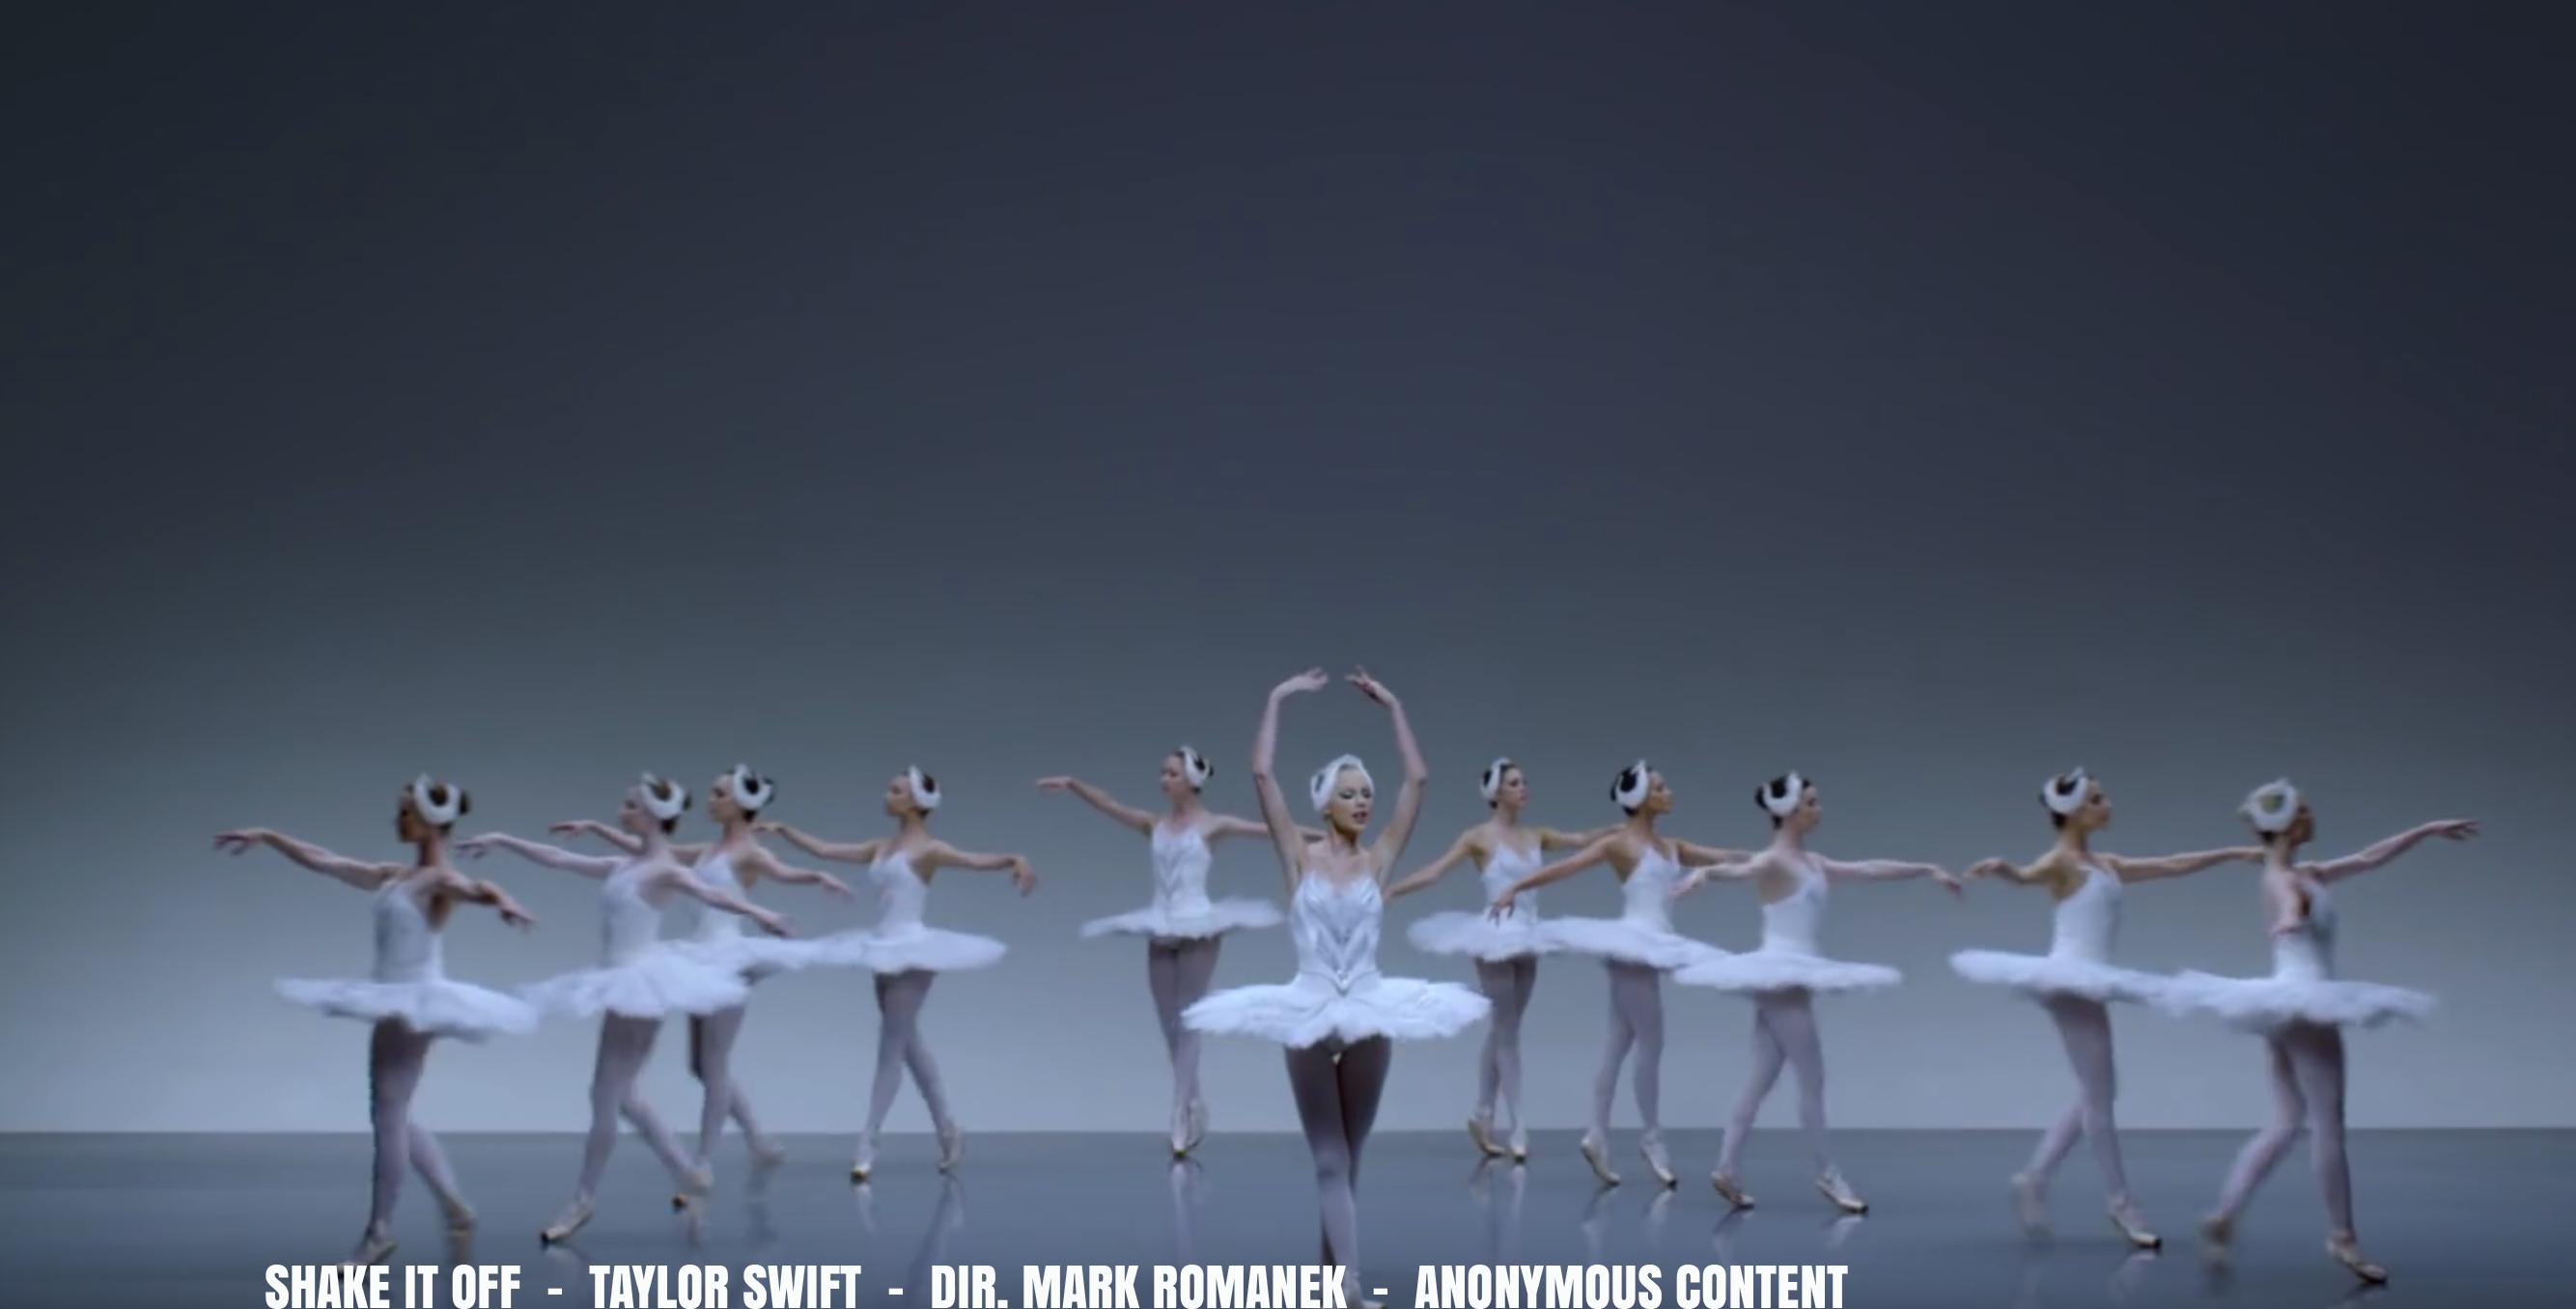 Taylor Swift - Shake It Off copy